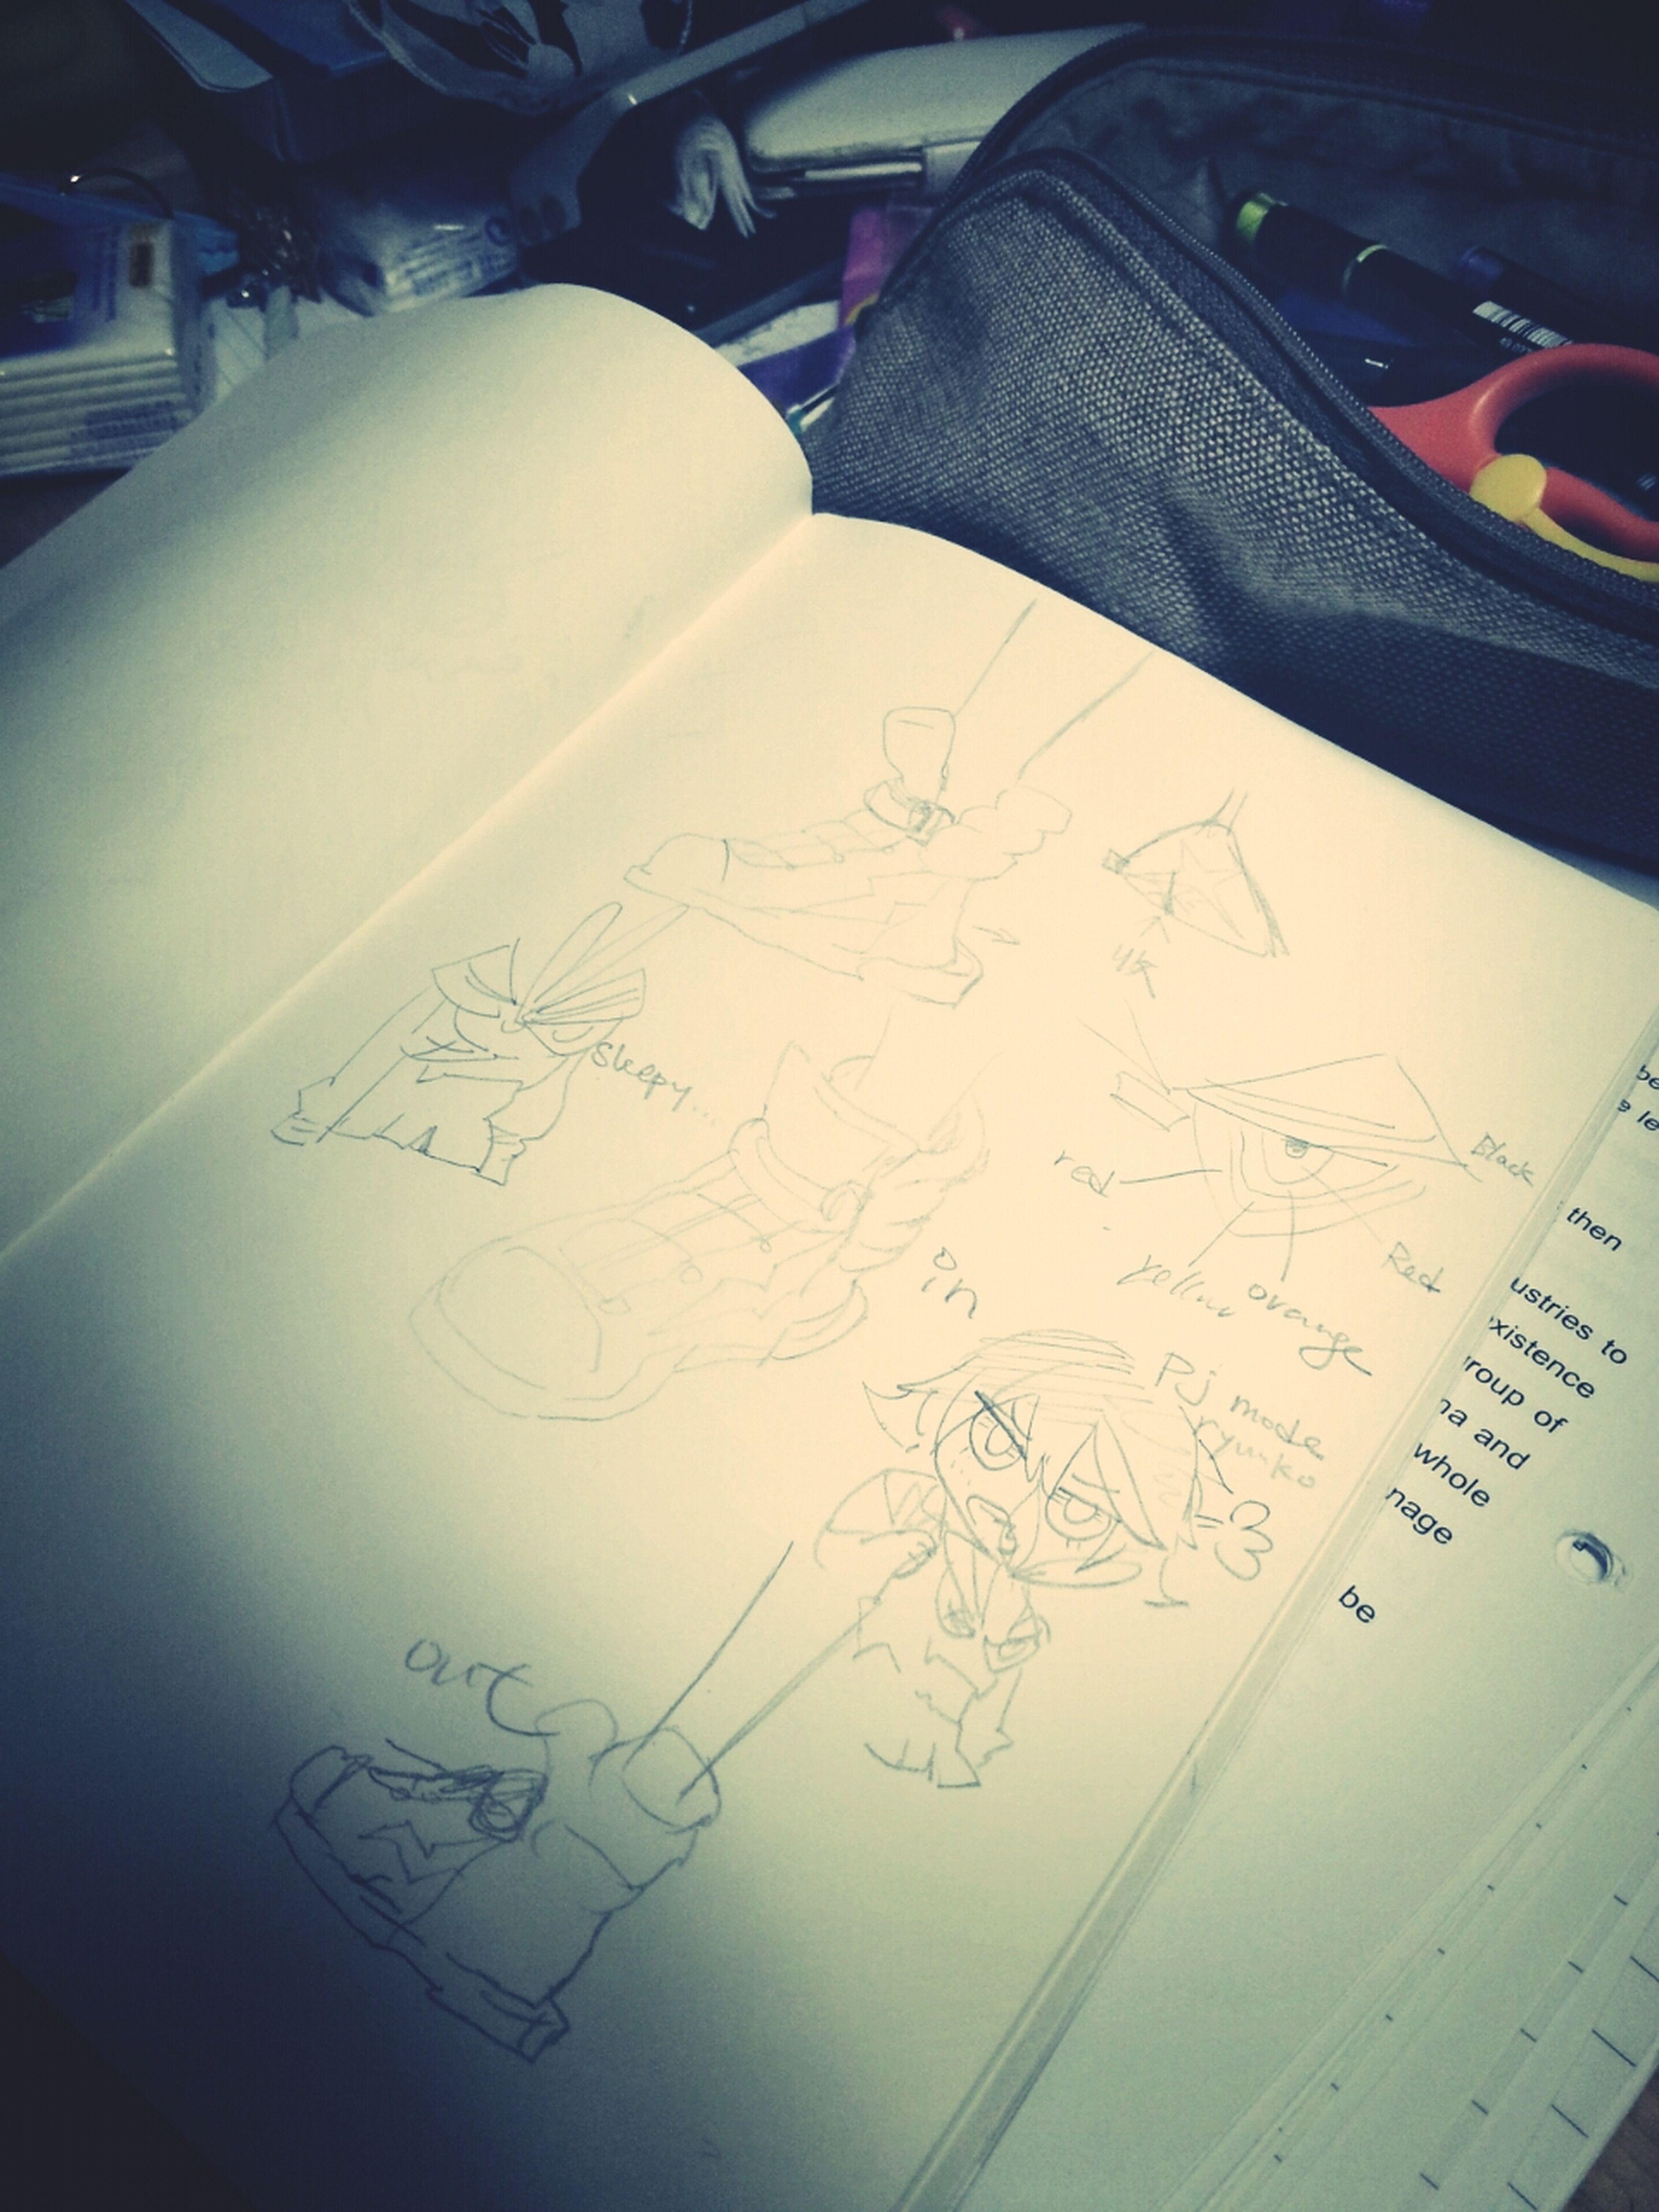 Draw for my next cos plan before sleep! Ryuuko and Senketsu TOO CUTE, and also Mr. Aikuro! Why glowing nipples???XDDDDD Kill La Kill  Cosplan Sketch Relaxing